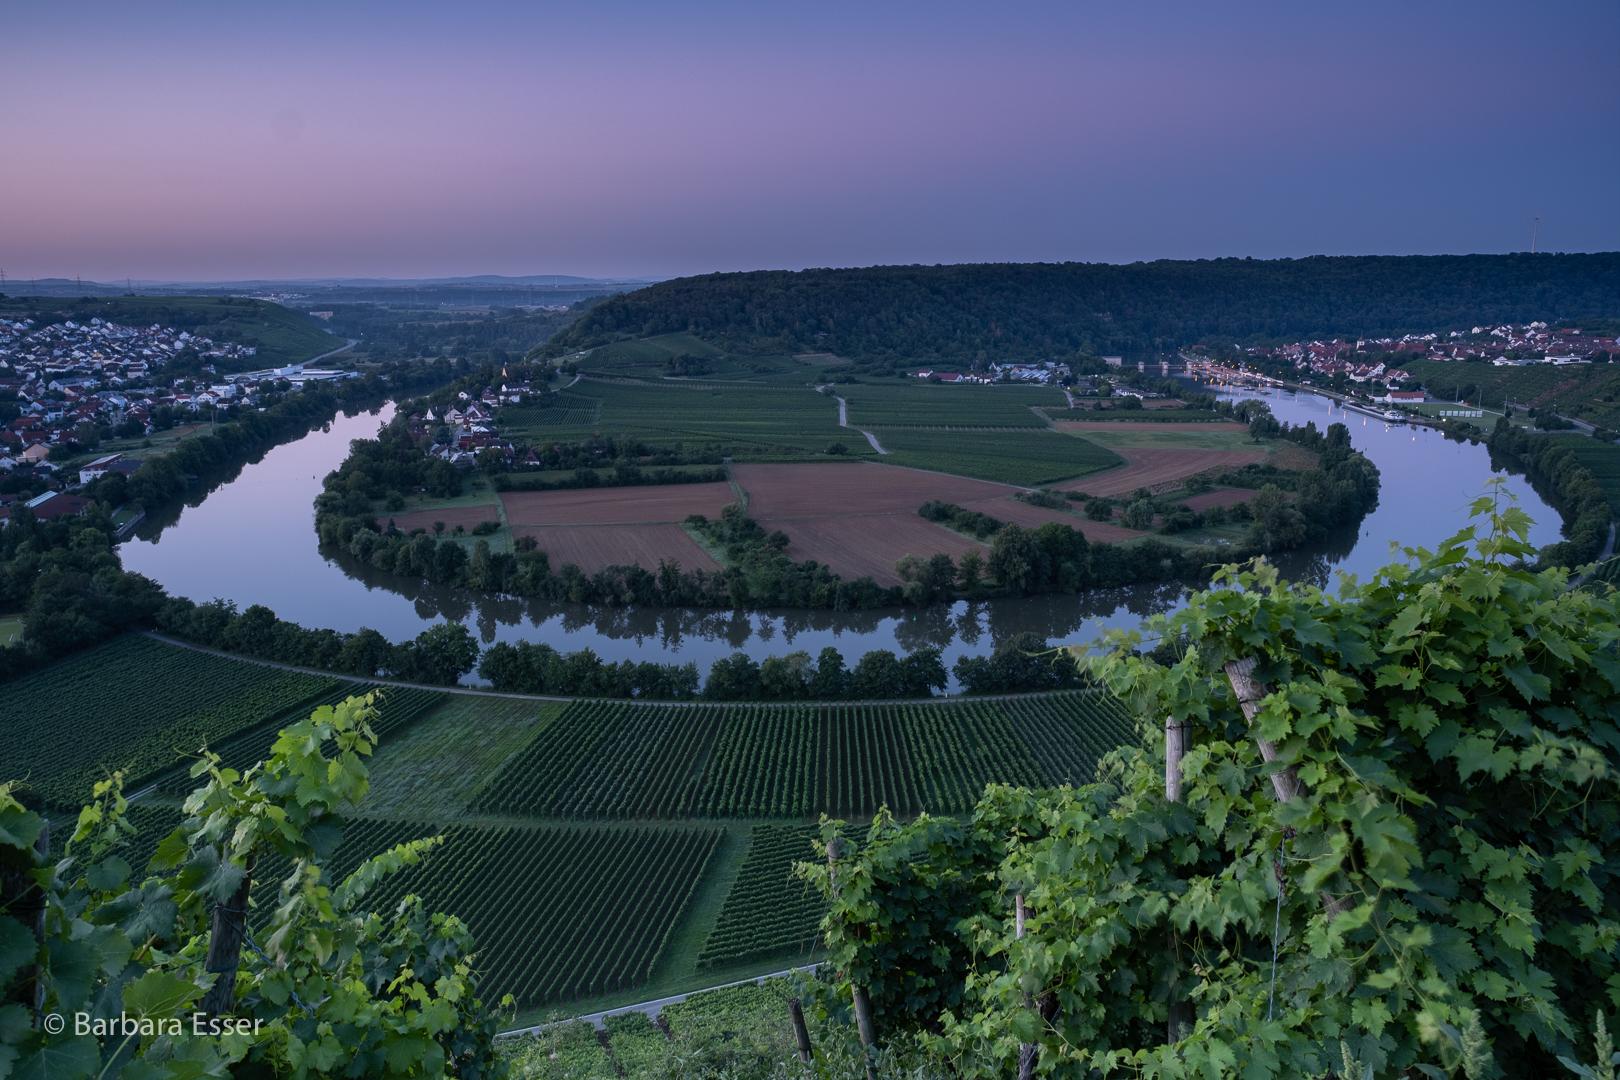 29-Engste Neckarschleife